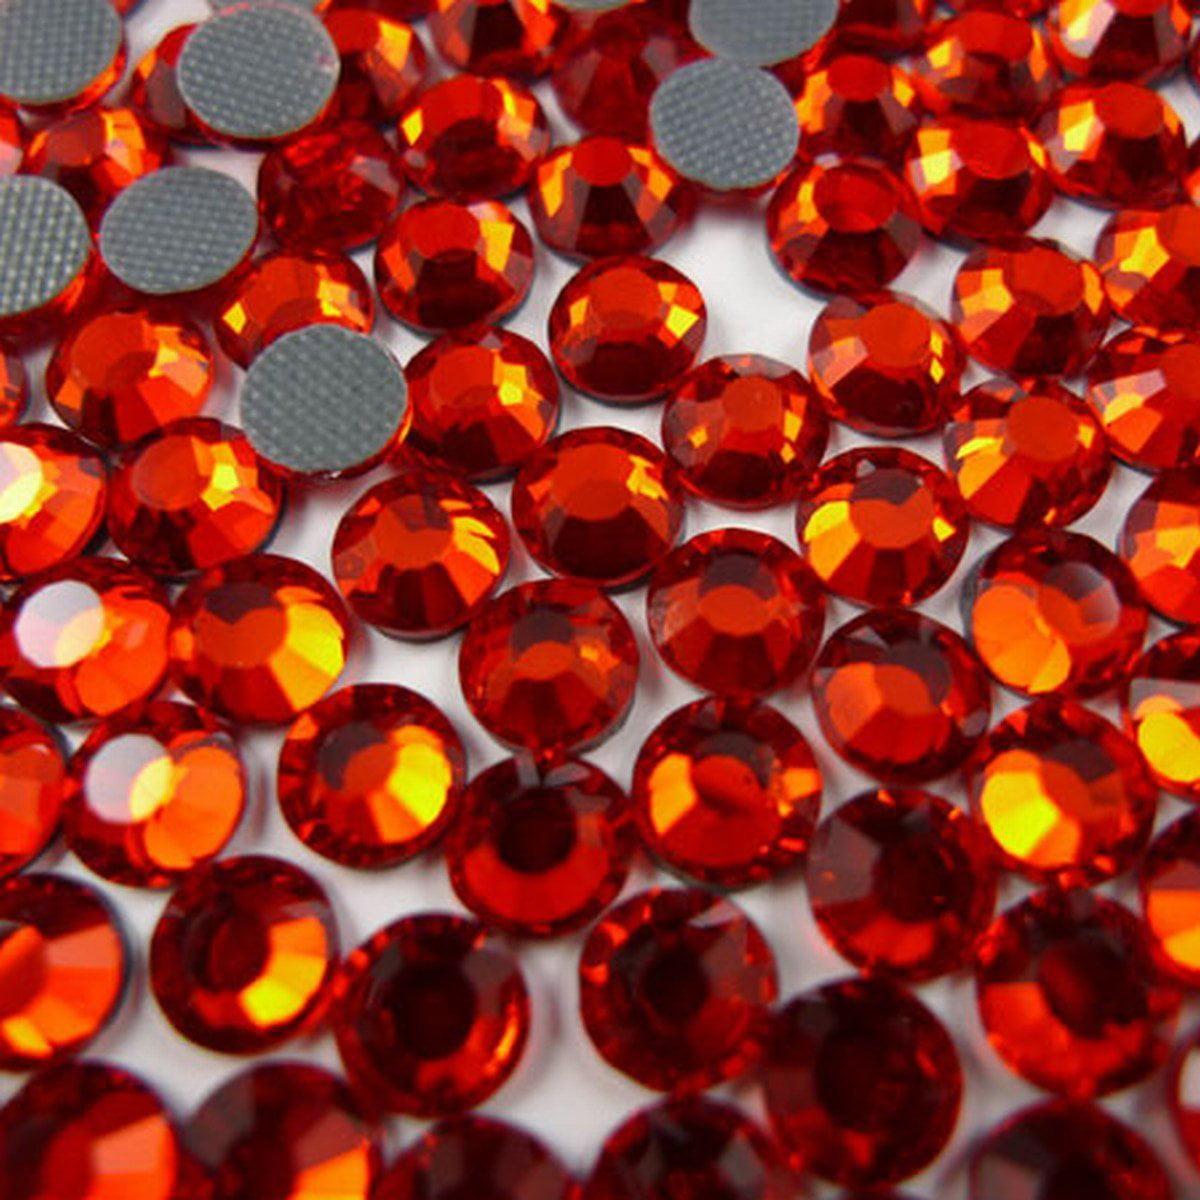 NEW ThreadNanny CZECH Quality 10gross (1440pcs) HotFix Rhinestones Crystals - 4mm/16ss, Hyacinth (Dark Orange) Color